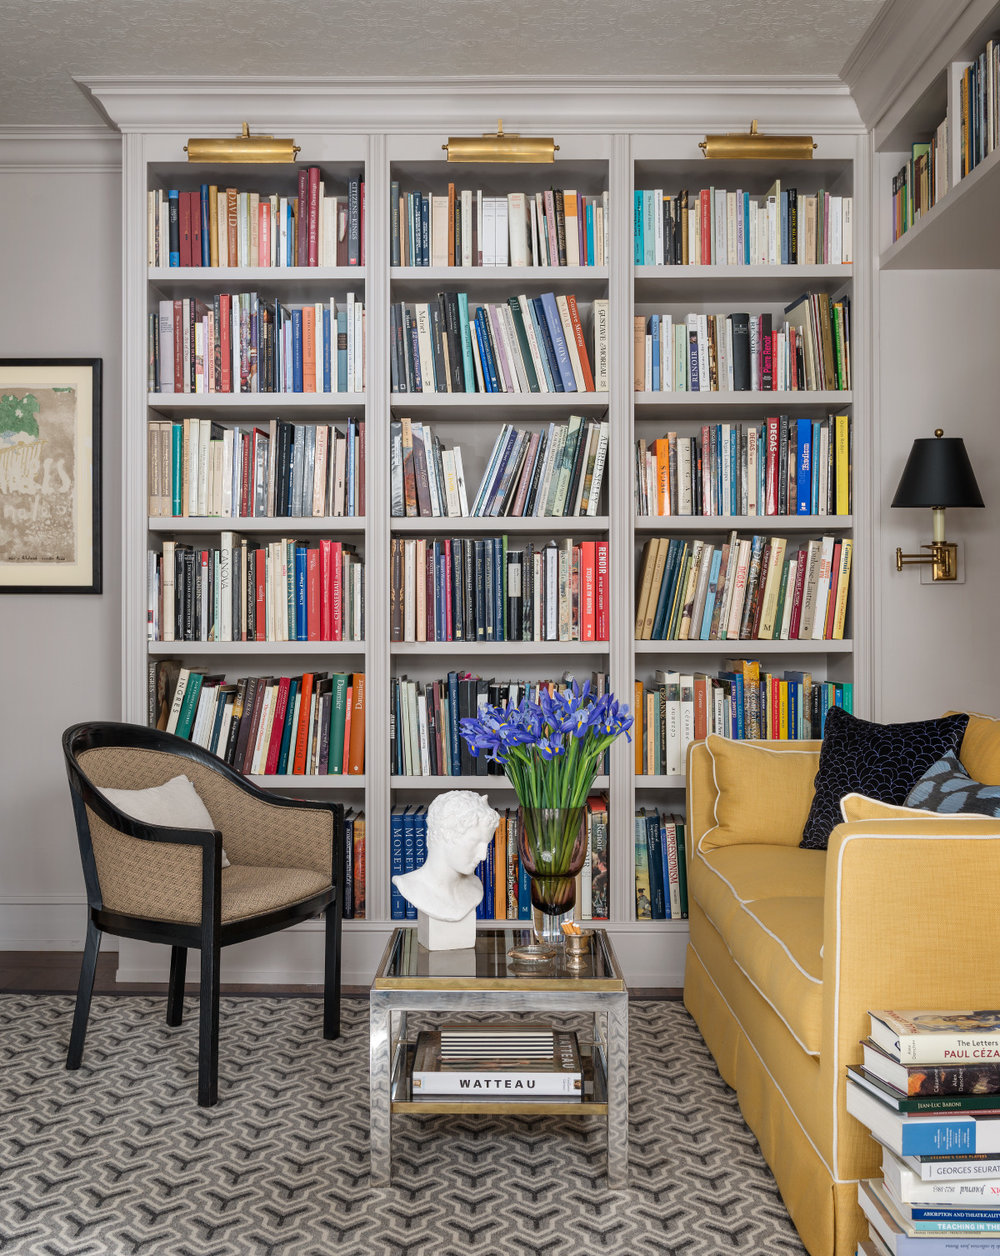 John K. Anderson Design  Library  Aaron Leitz  Photography